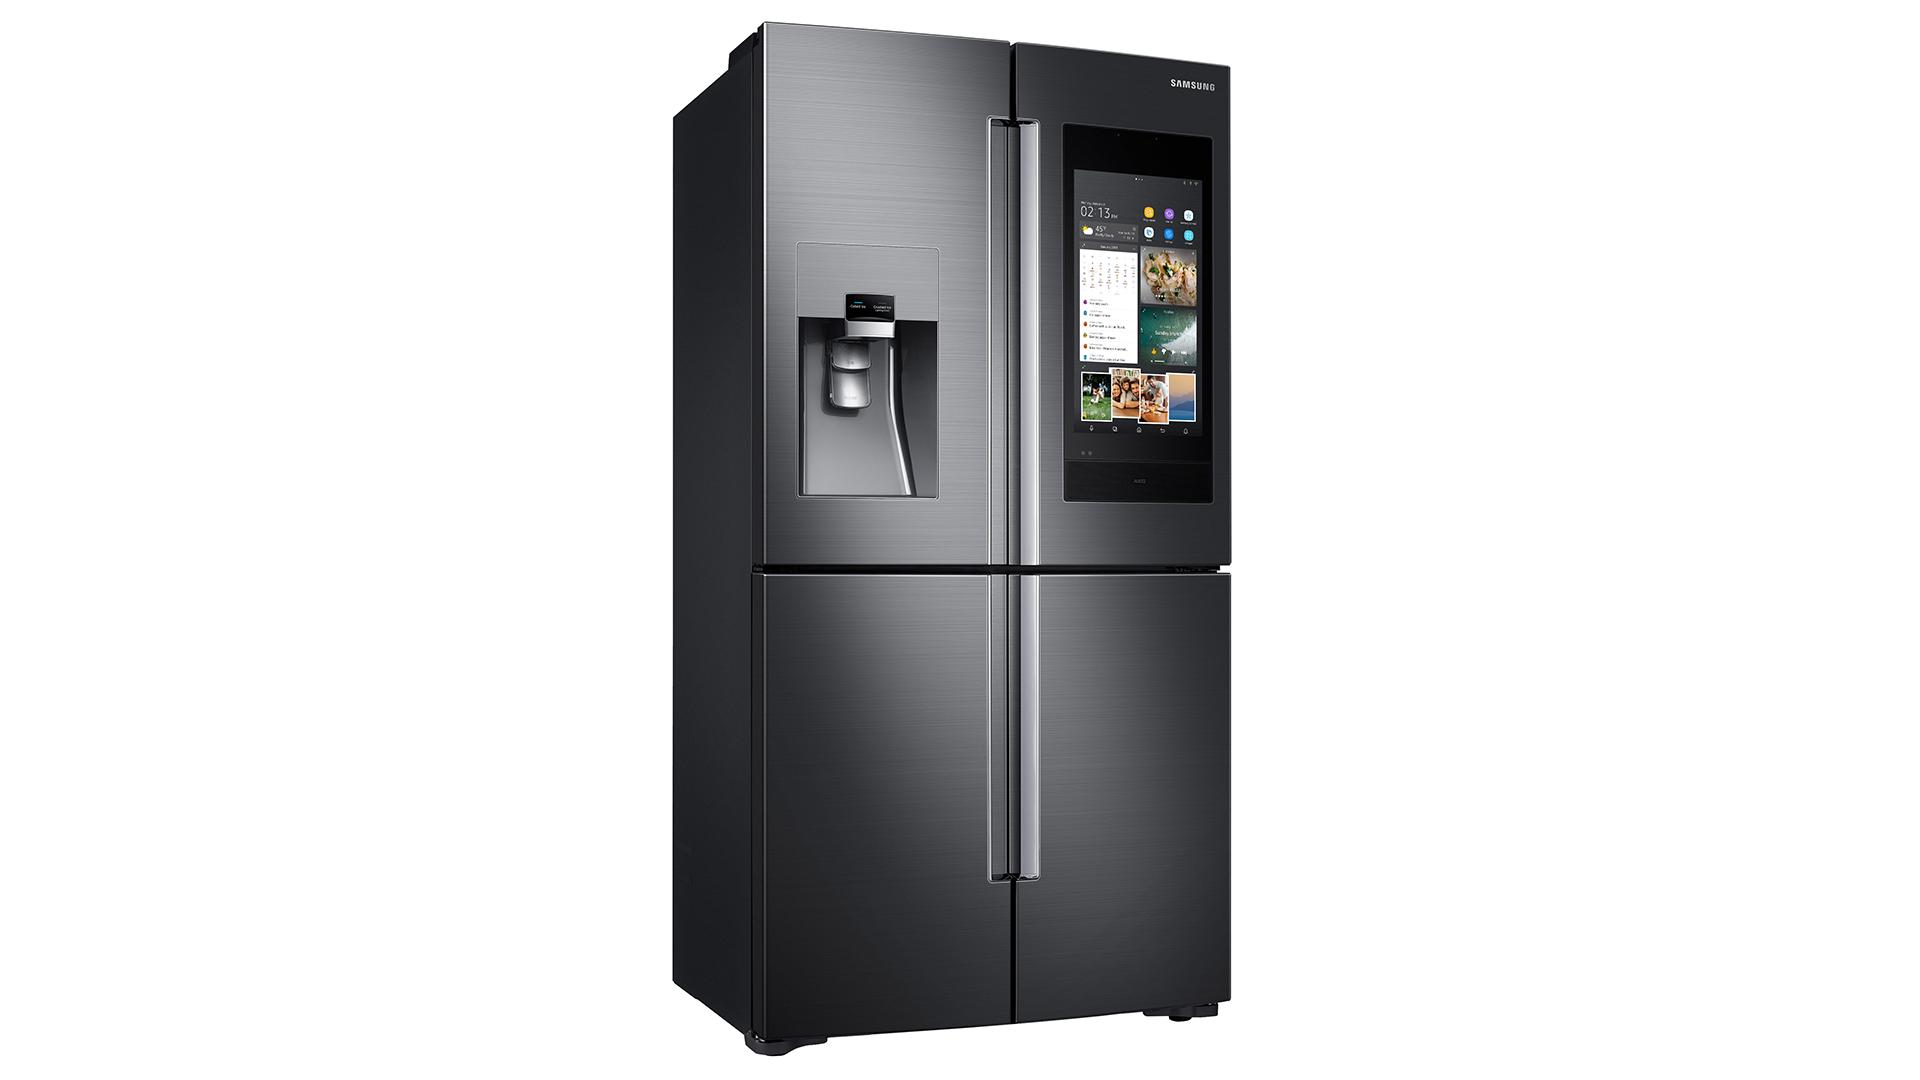 A photo of the Samsung Family Hub fridge.